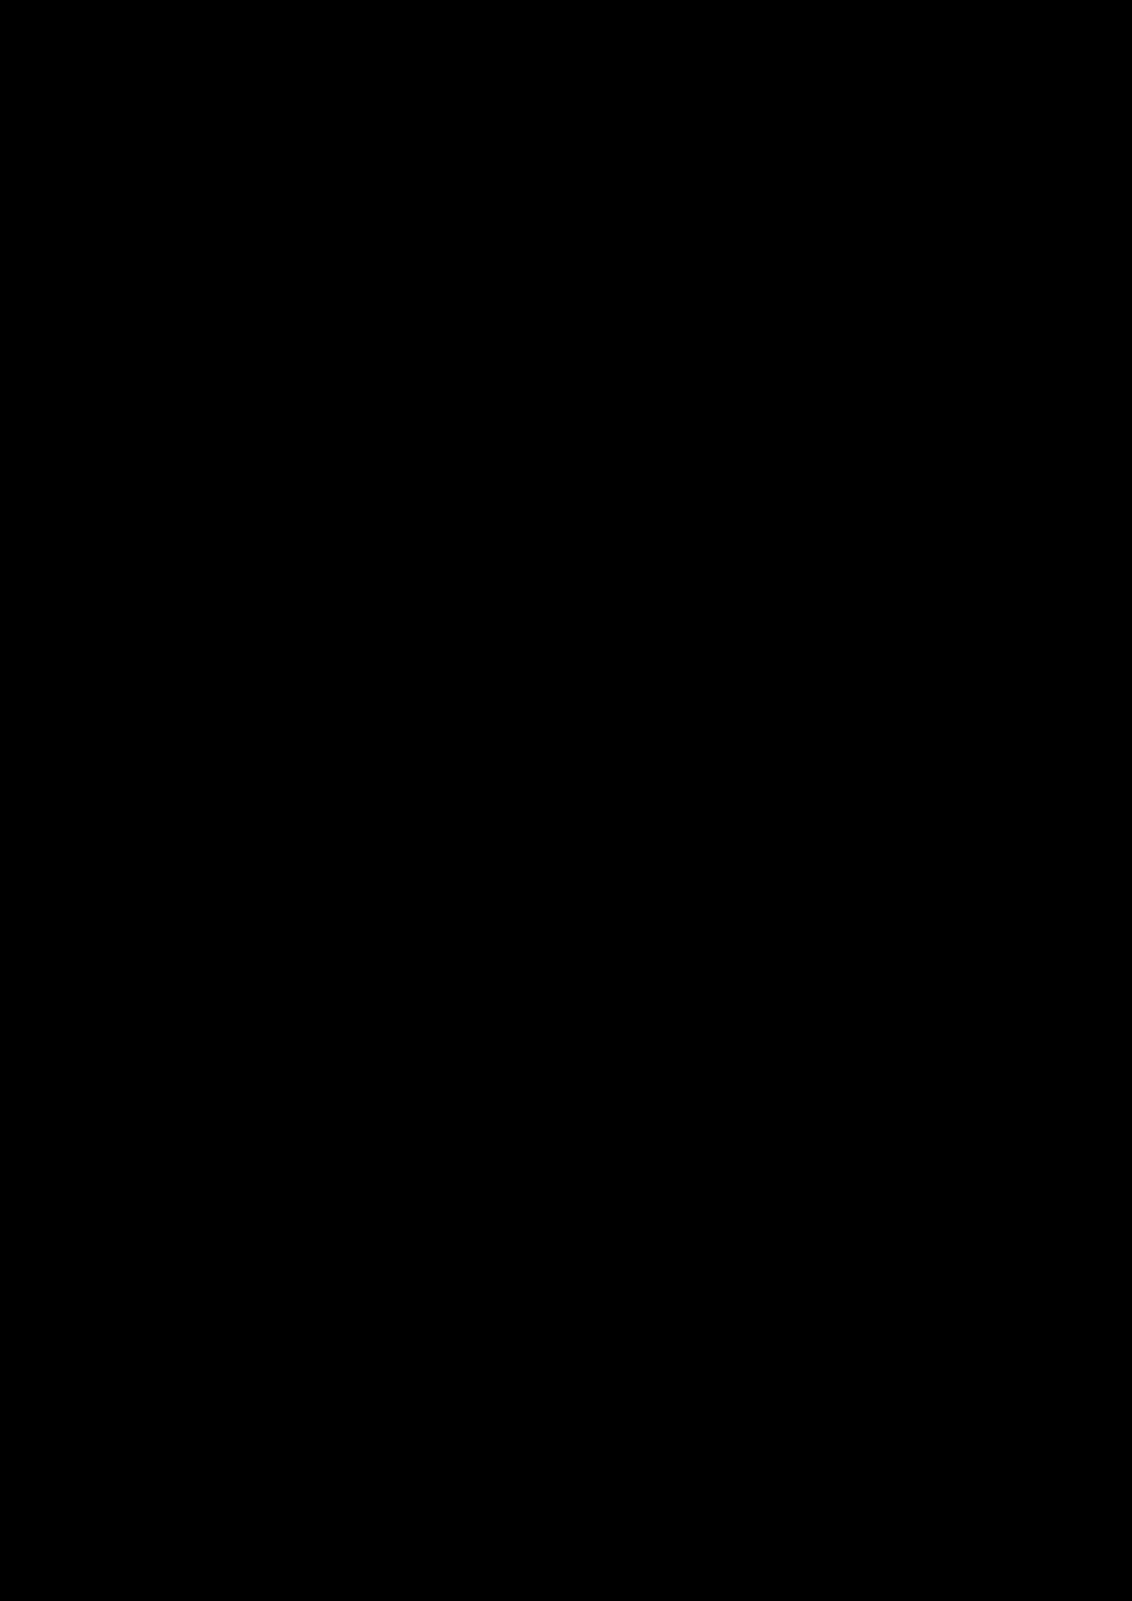 Ispoved Pervogo Boga slide, Image 56